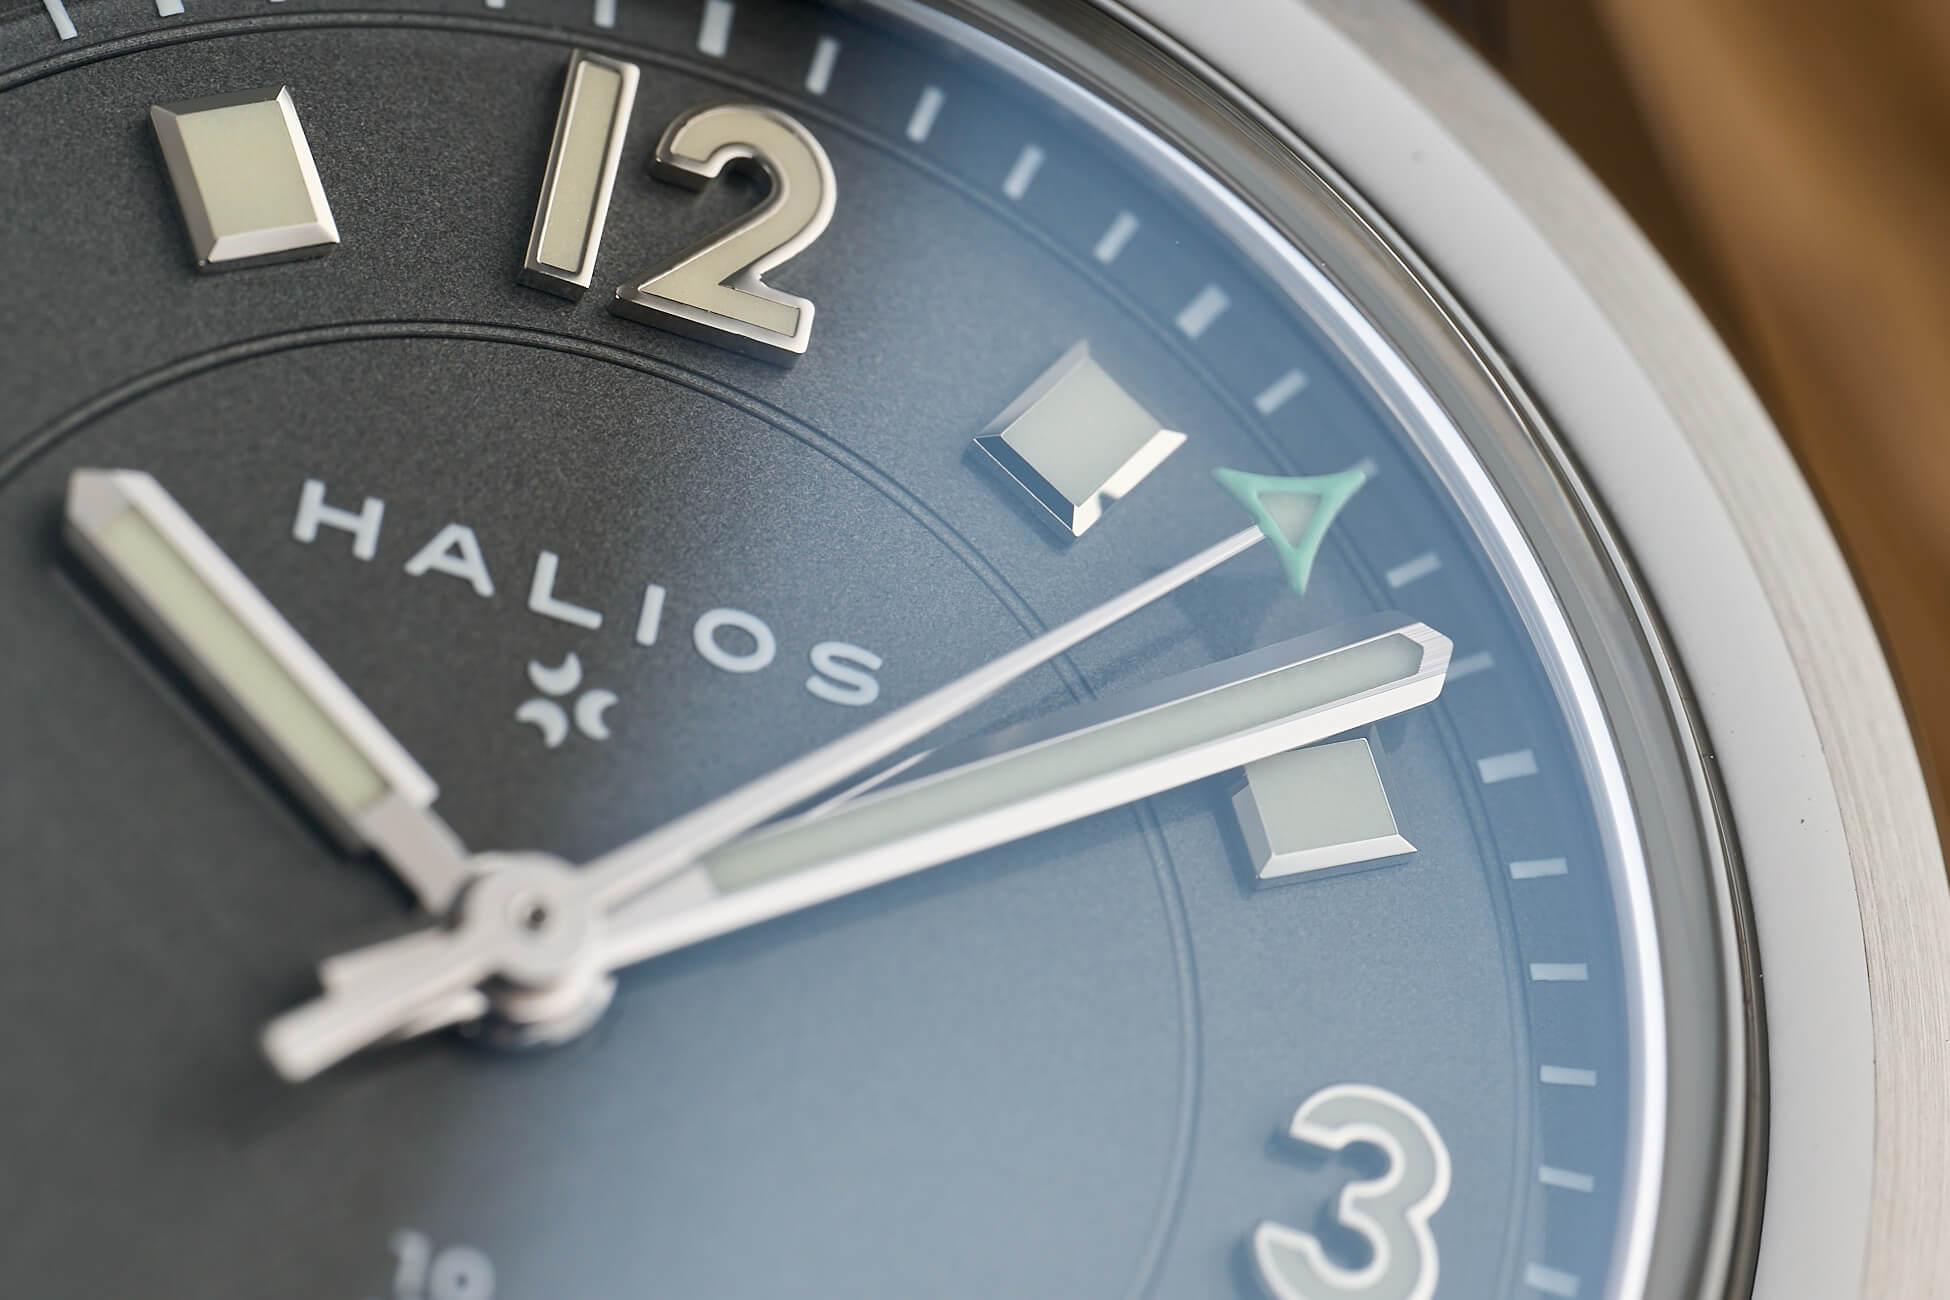 halios-universa-12